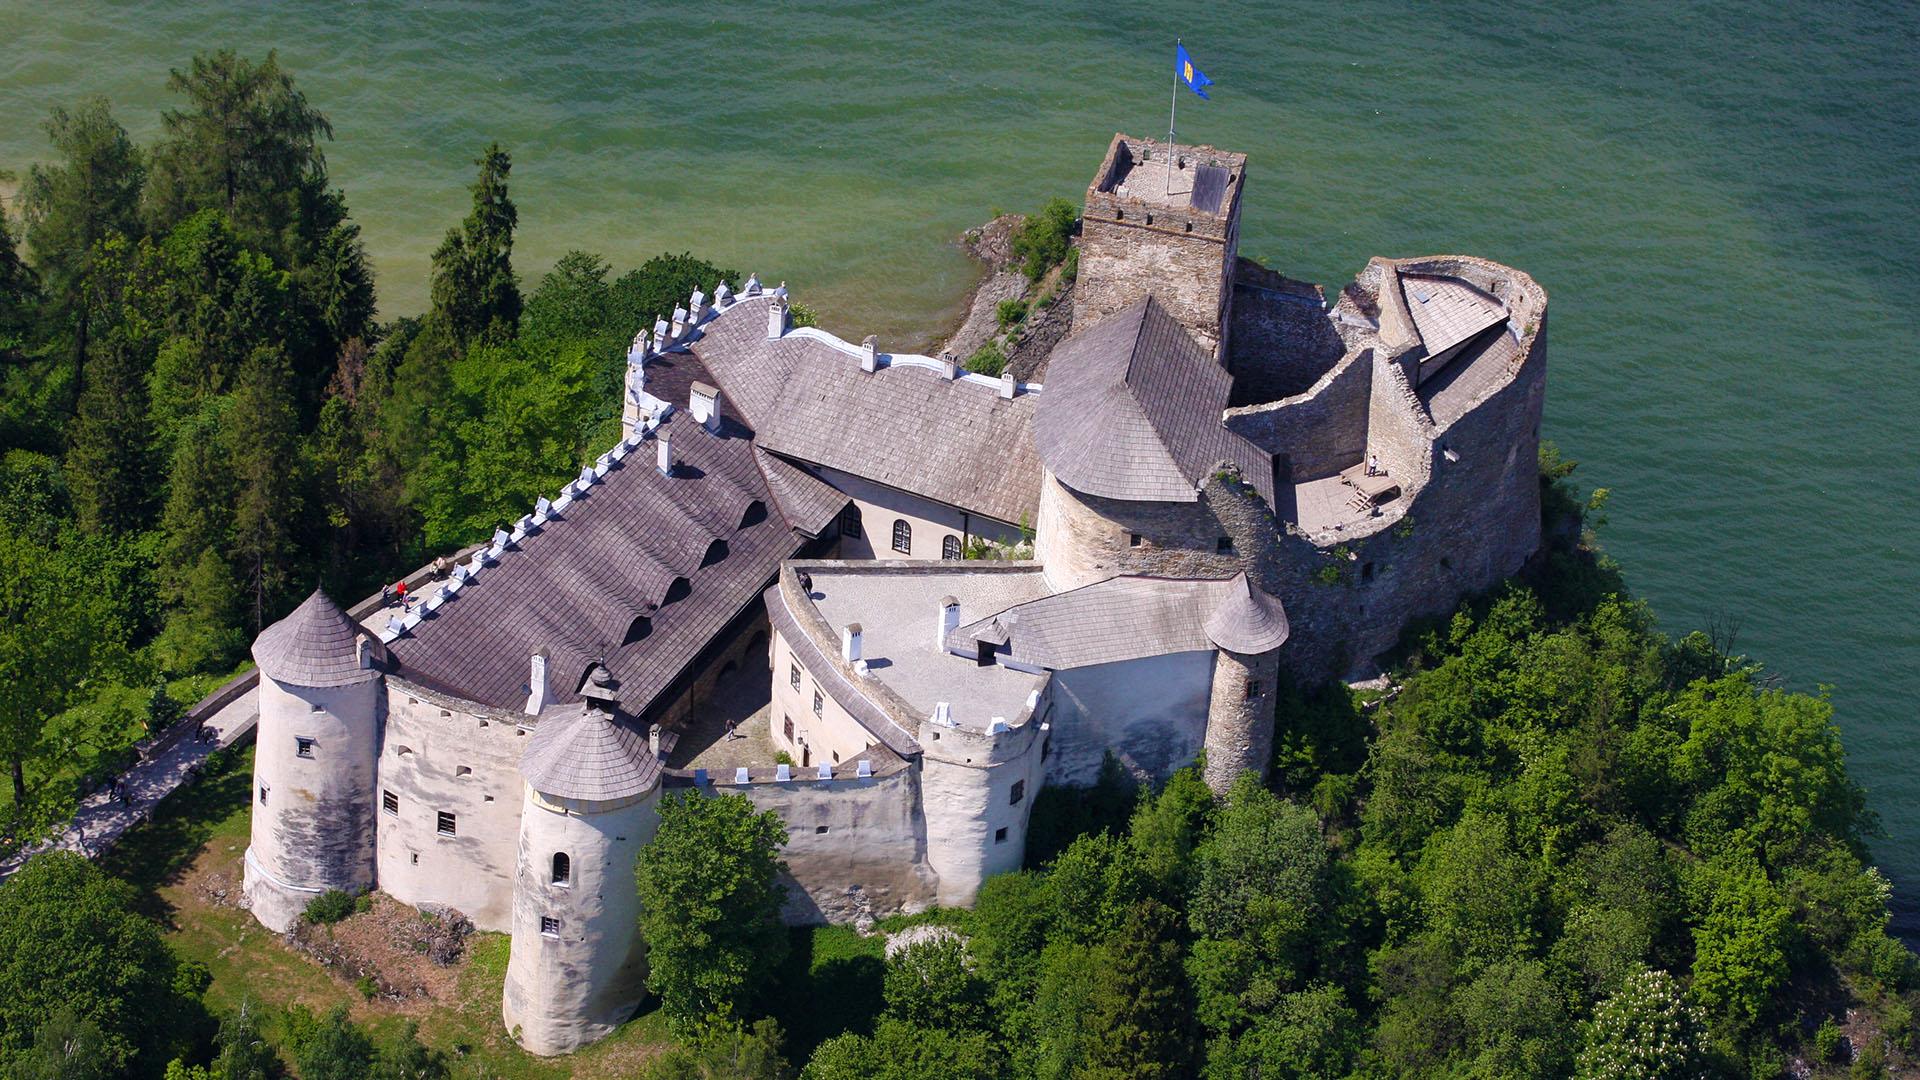 Chapter Spisska and Spissky Castle at night, Slovakia